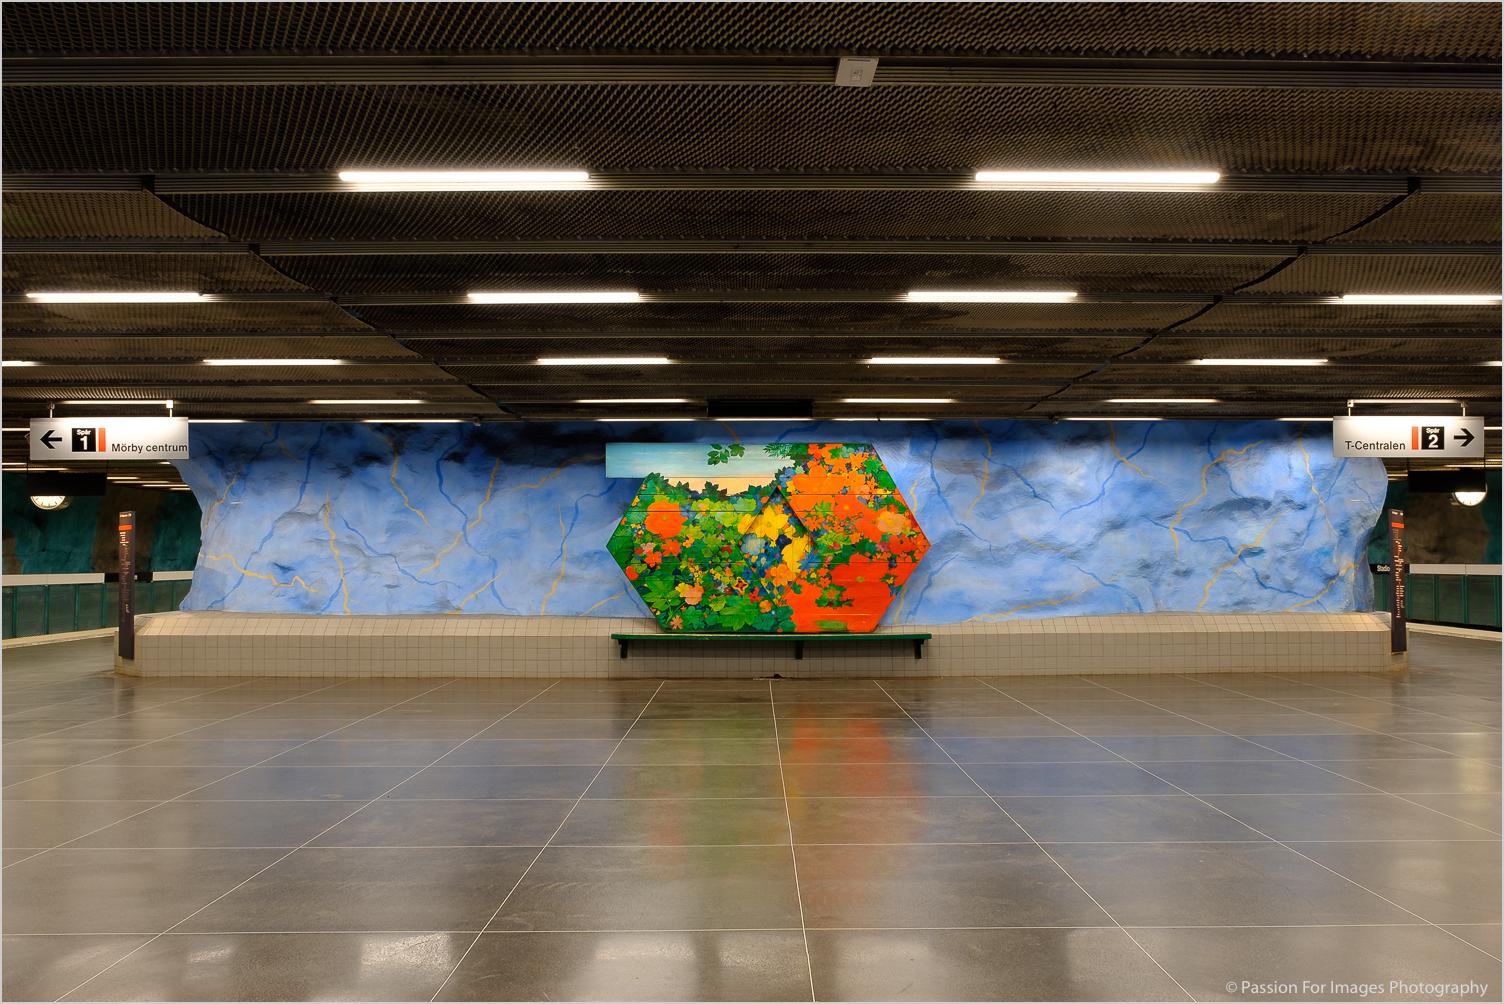 DSCF8758_2019_08_Skandinavien-Subway-Stockholm-Art-Project.jpg